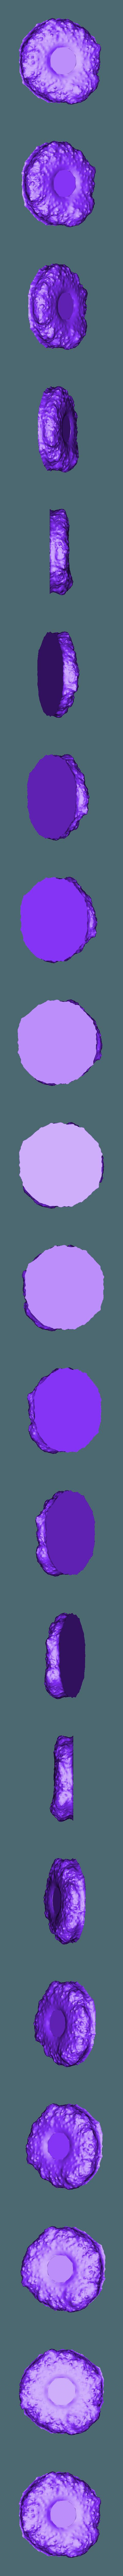 Atomic-Bomb-MIDDLE-STL.stl Download STL file Atomic Bomb LED Lamp • 3D printing template, pumpkinhead3d